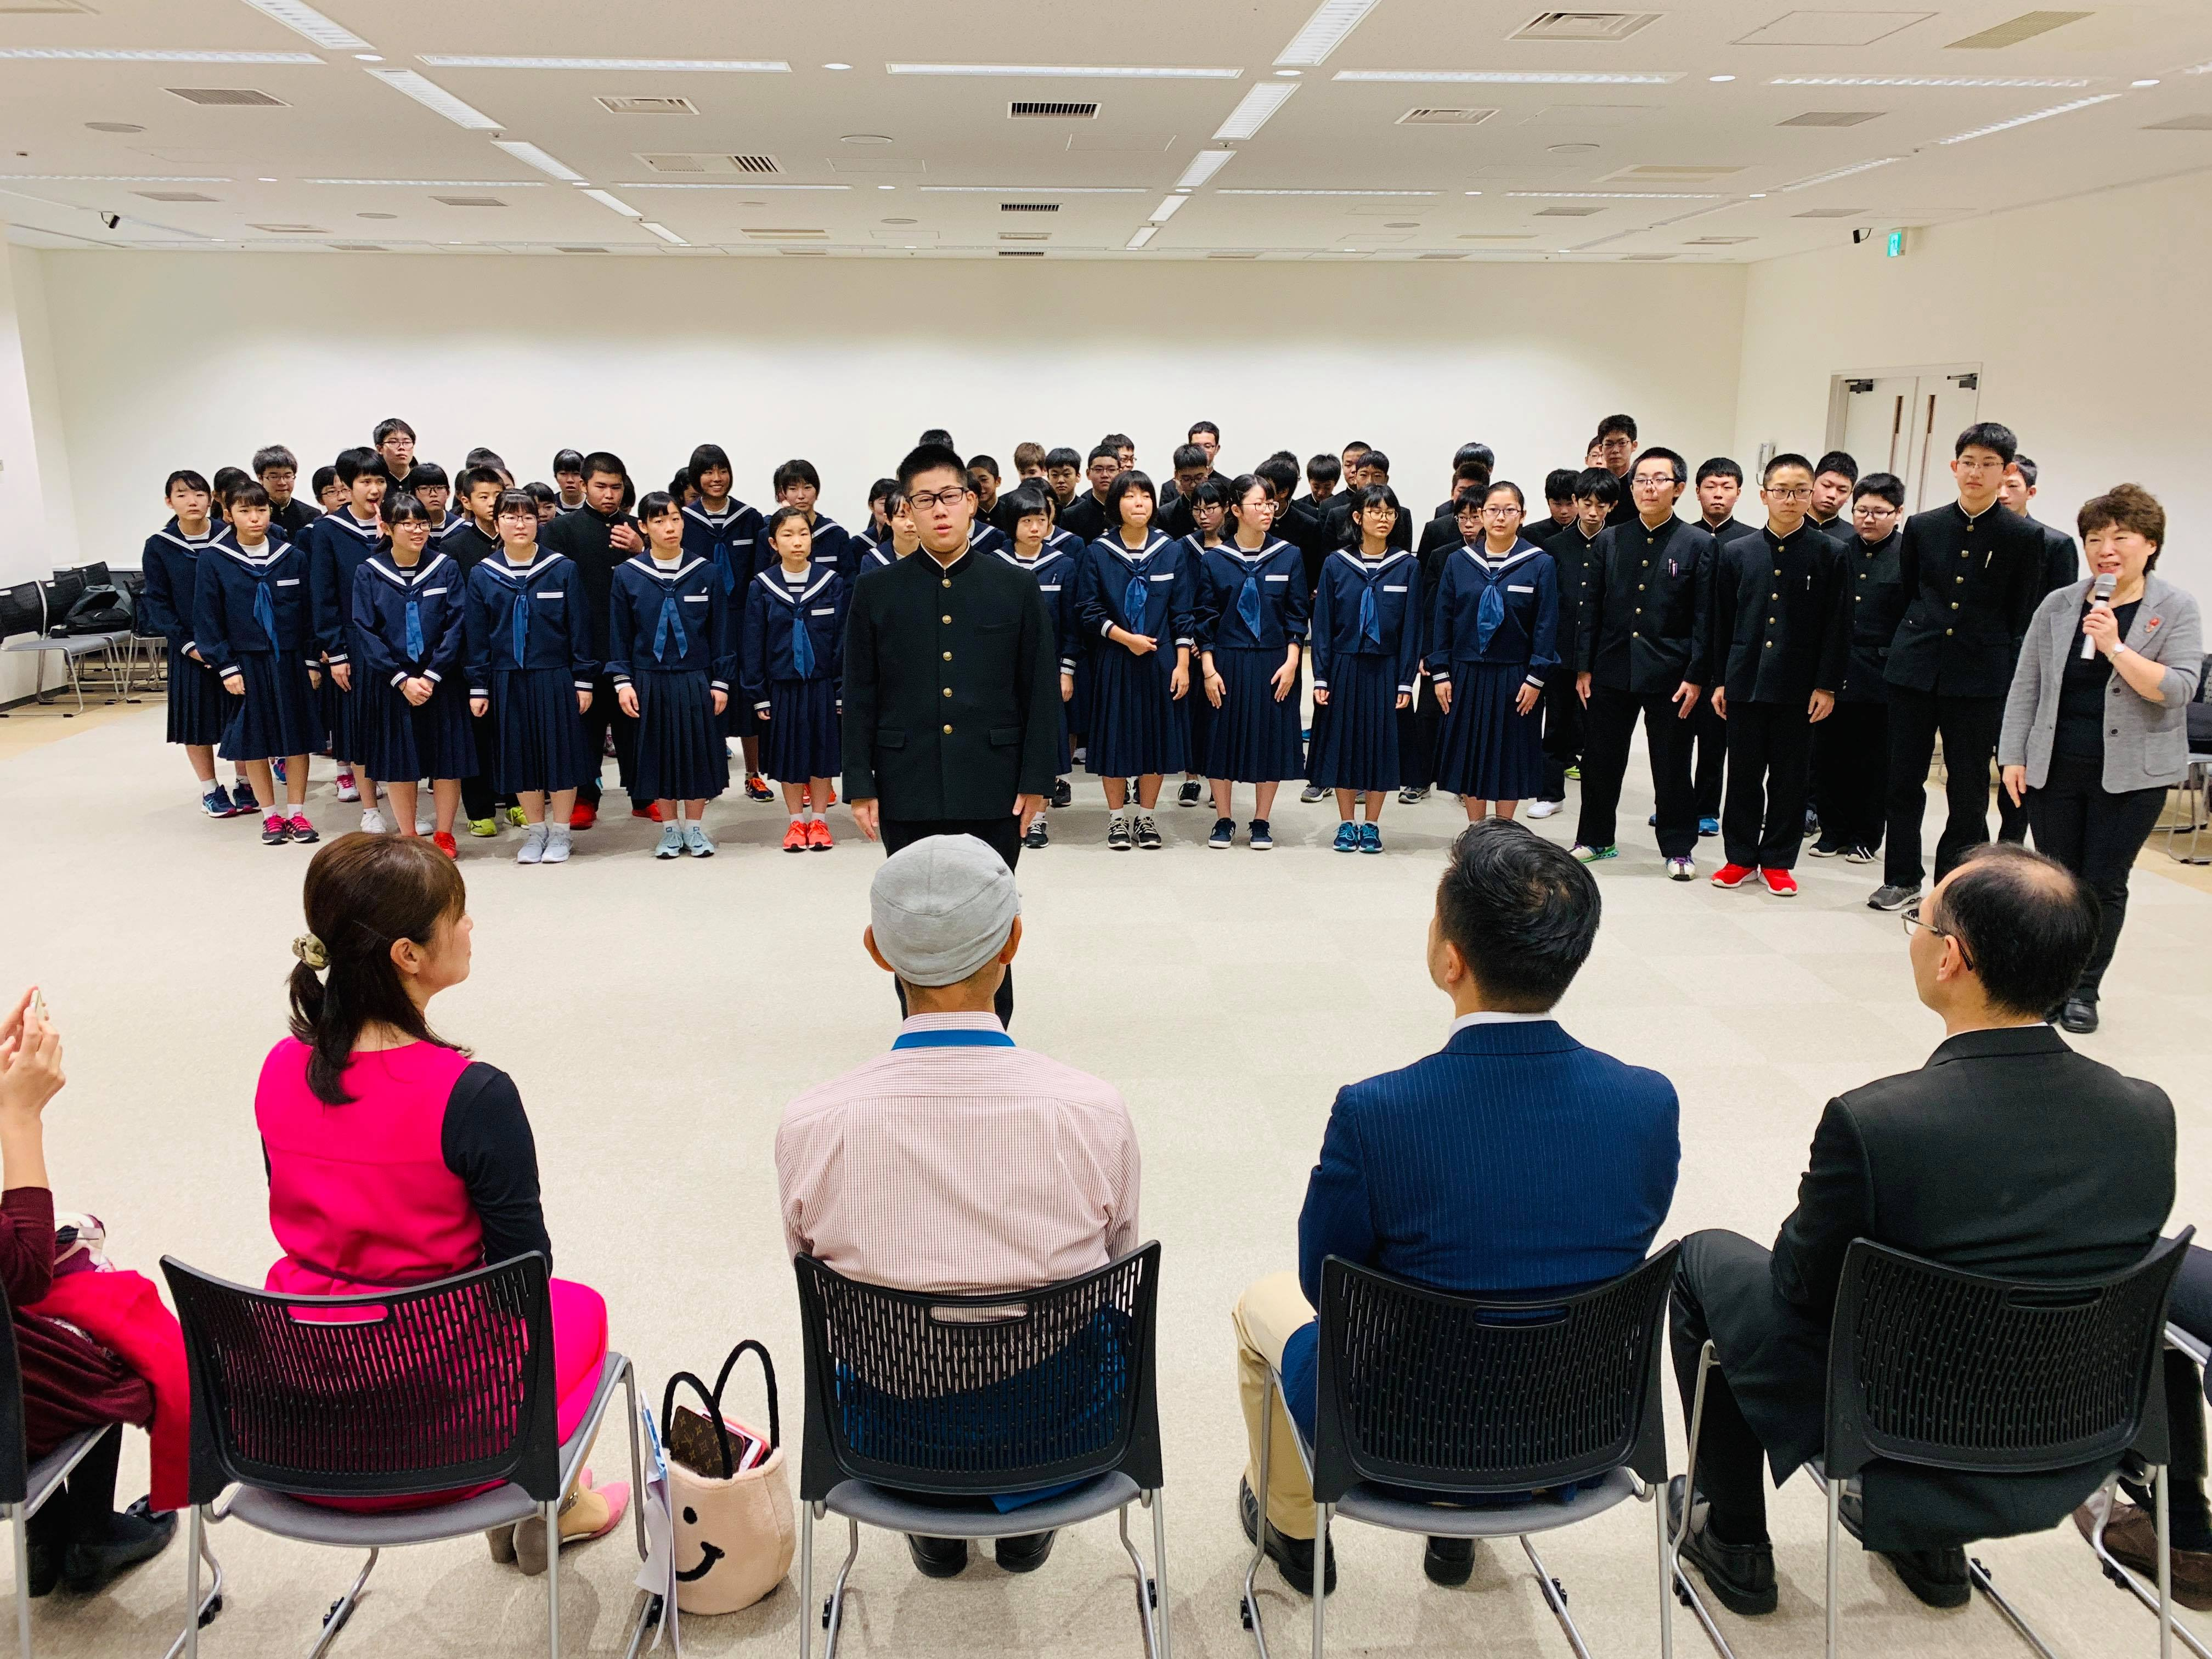 45546892 1213262172158008 2974655952201973760 n - 2018年11月7日青森県東北中学校AFS(AOsukiフューチャーズゼミ)開催しました。